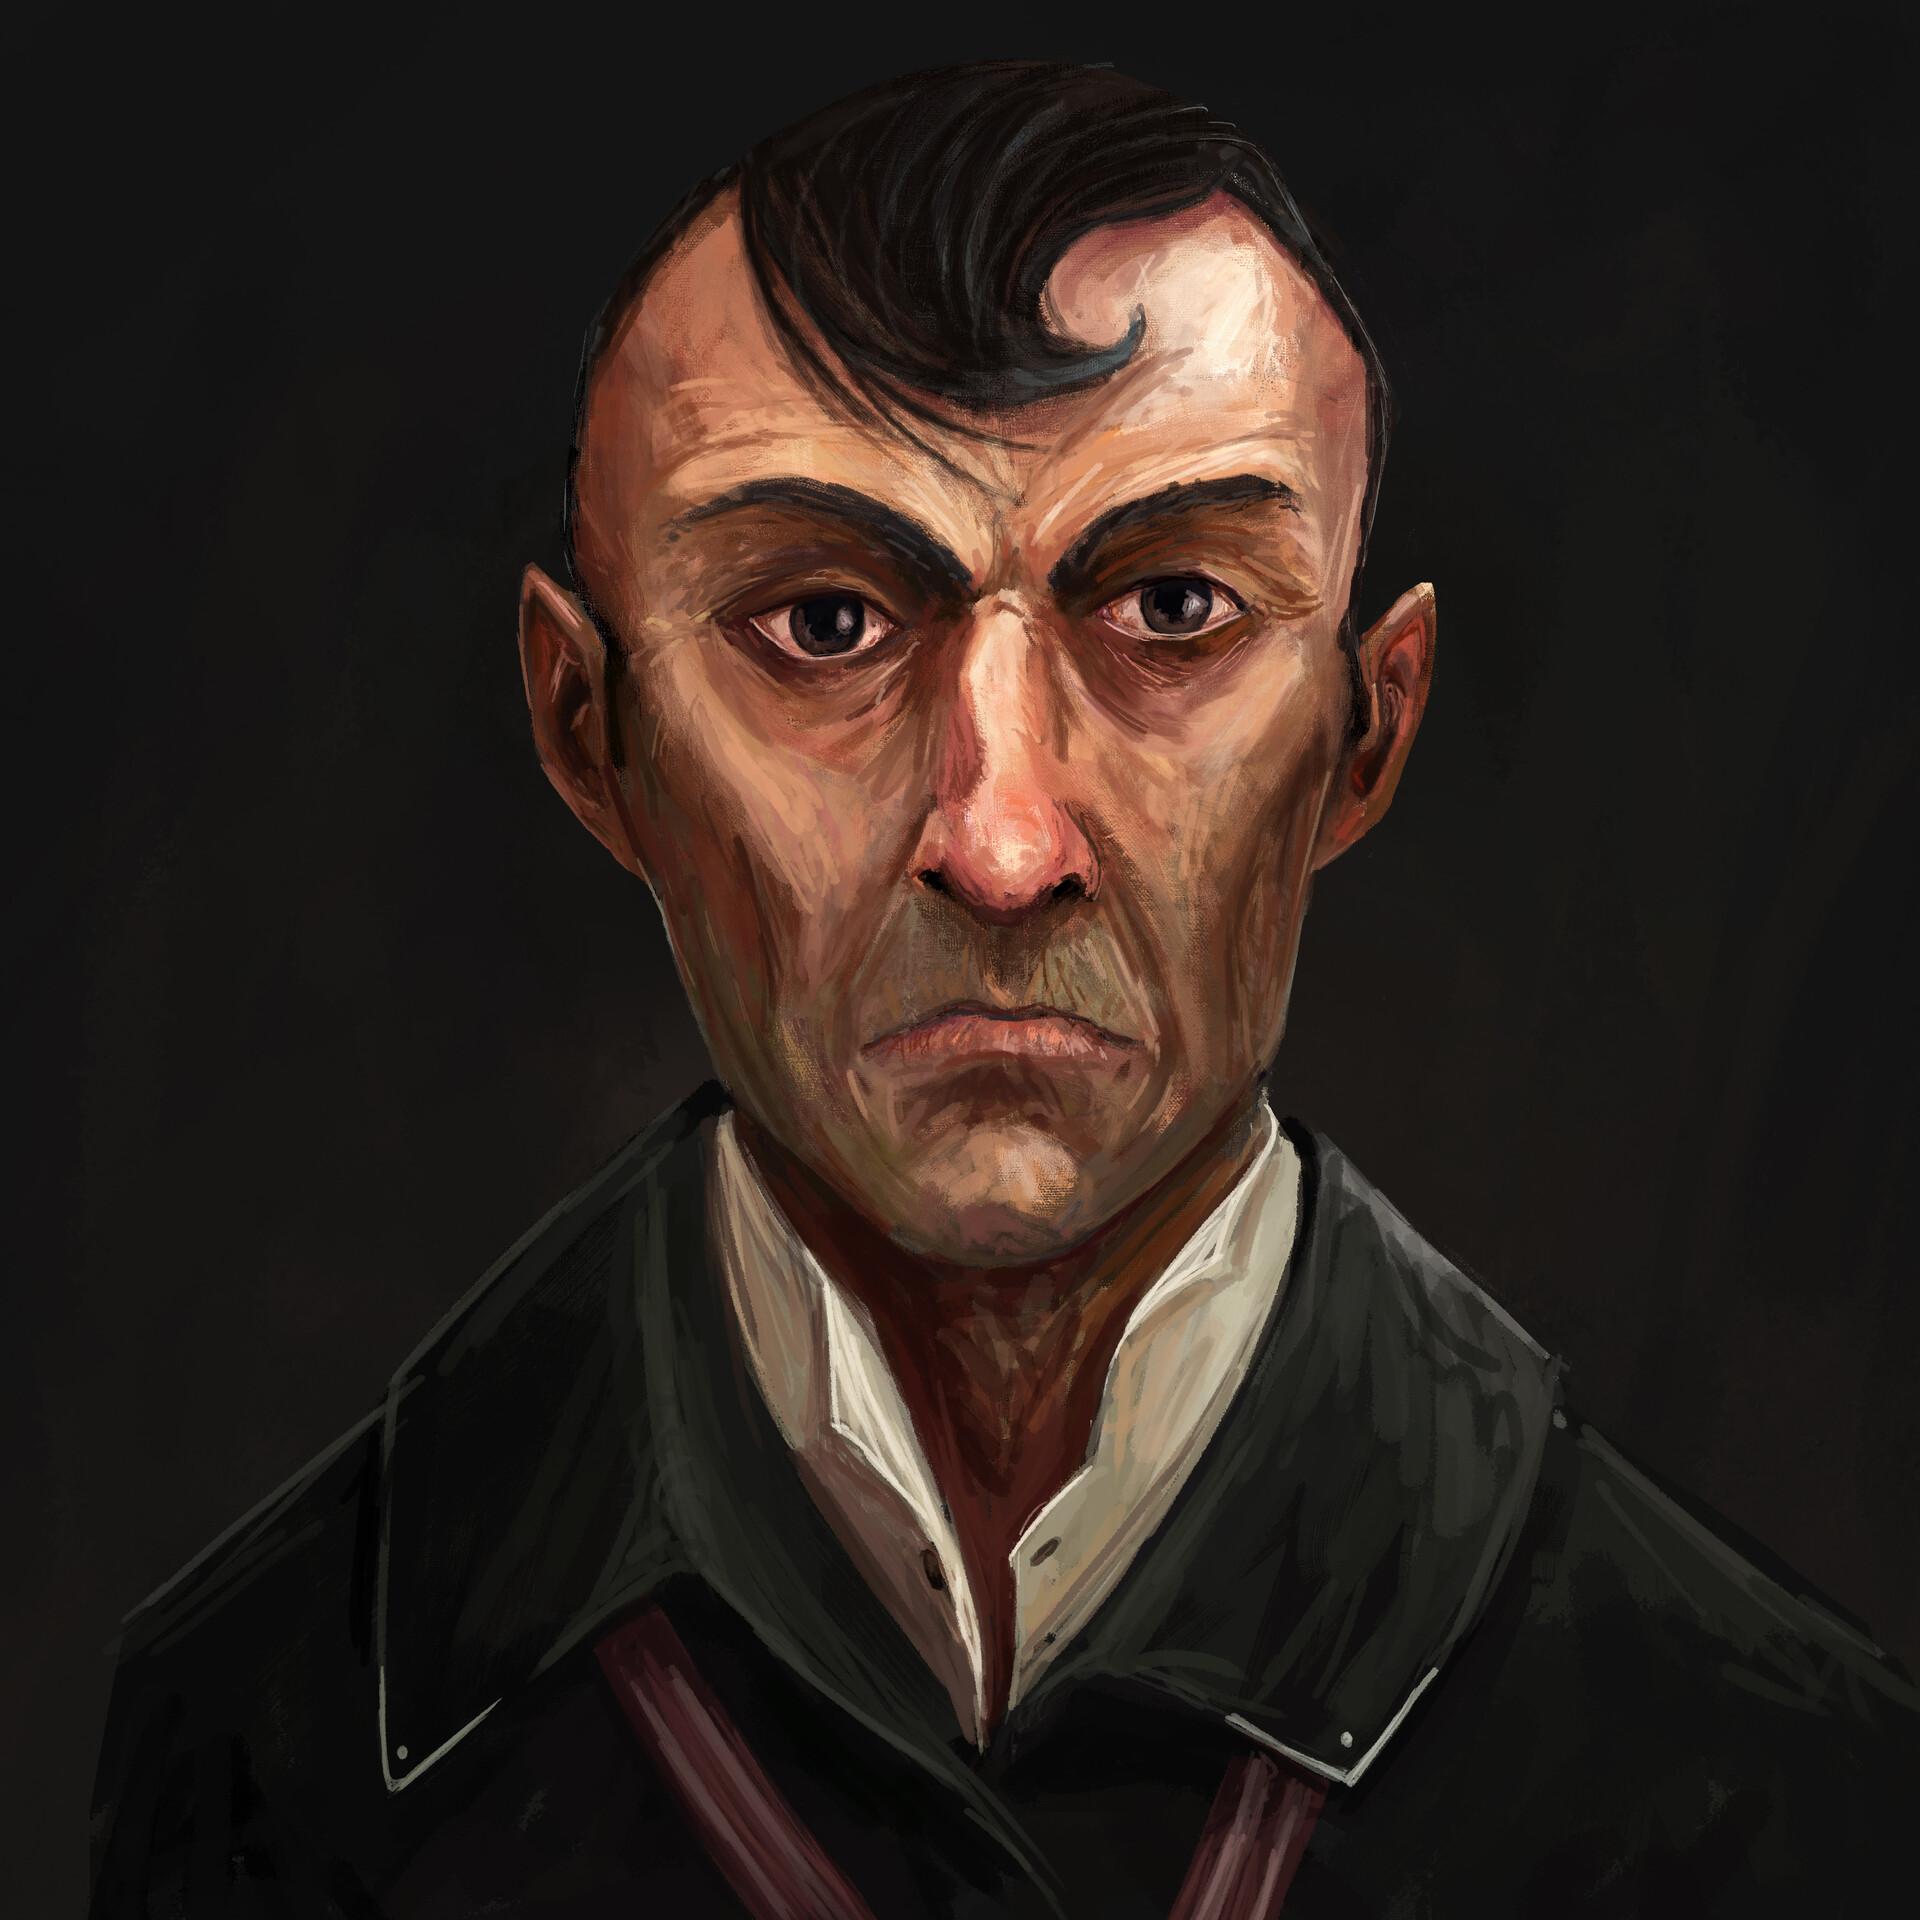 Jack dowell portrait evil guy